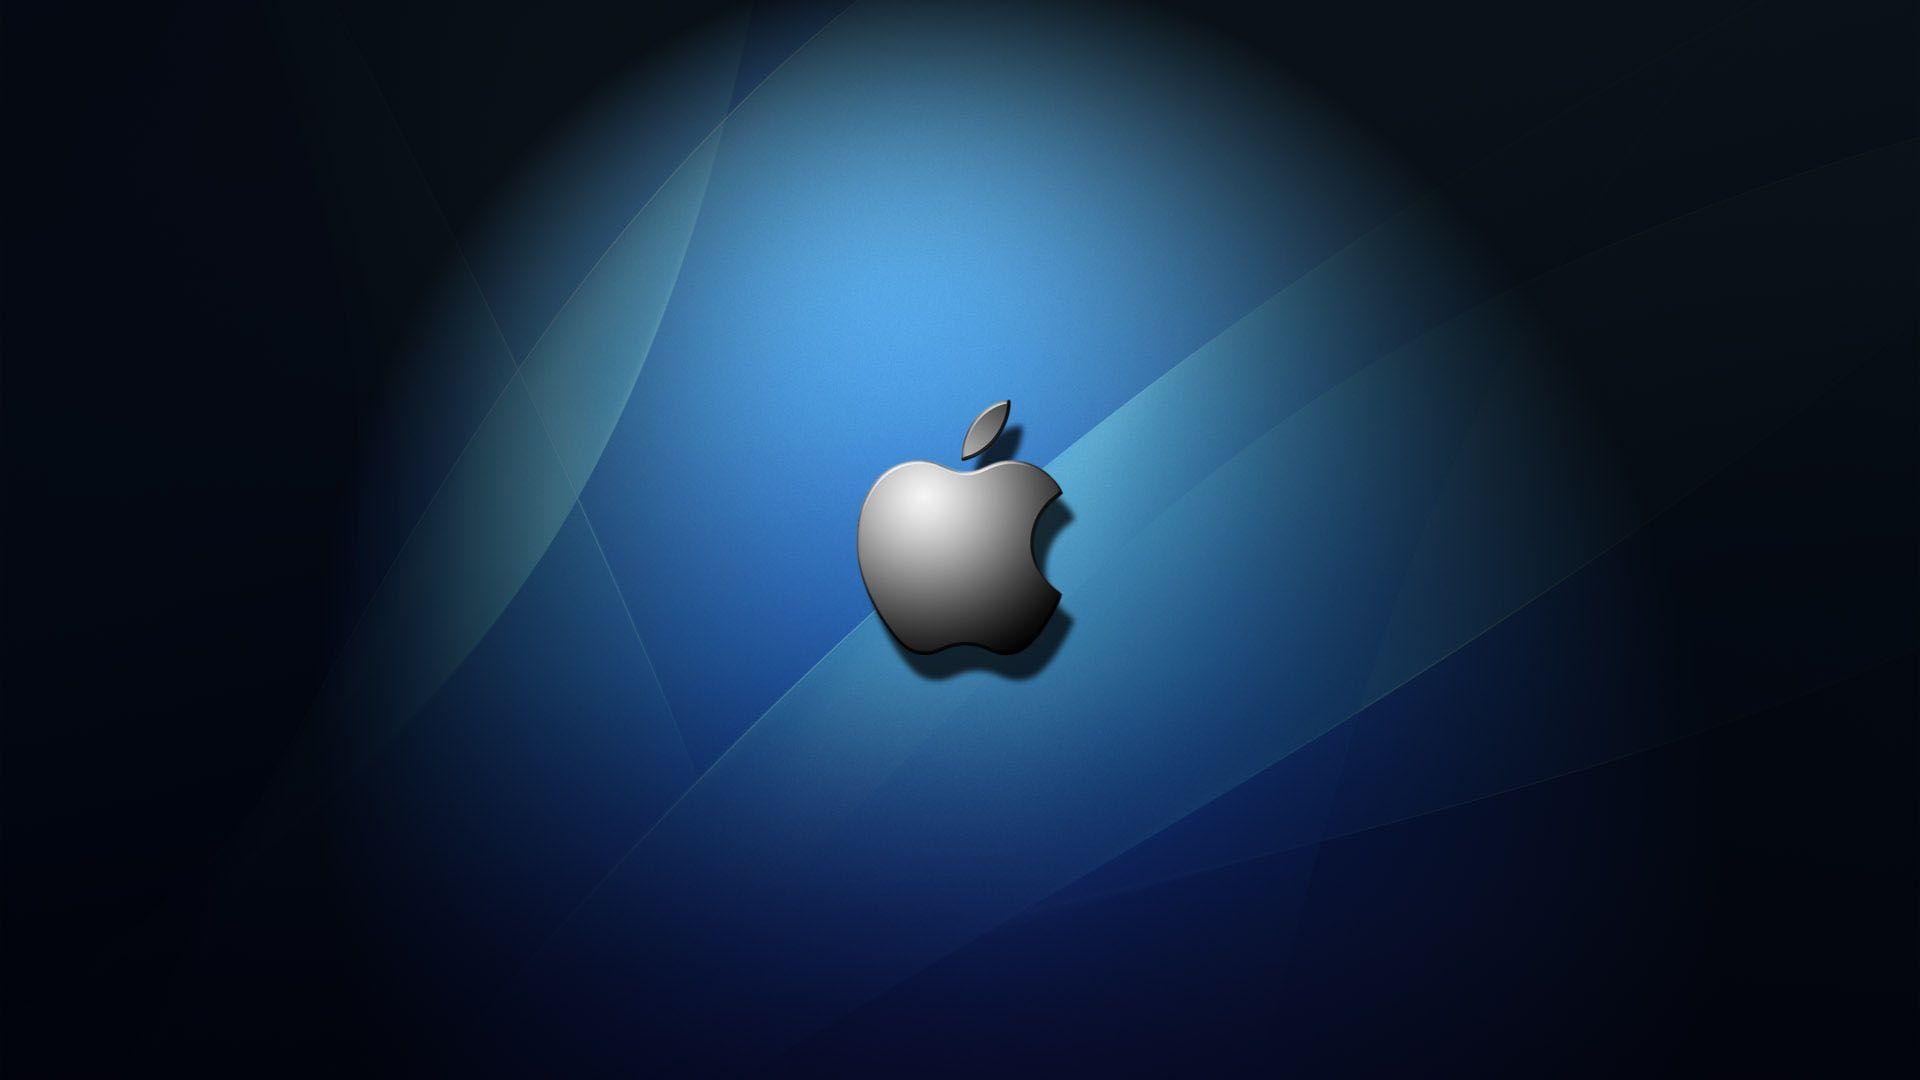 Cool Desktop Backgrounds For Mac - Wallpaper Cave